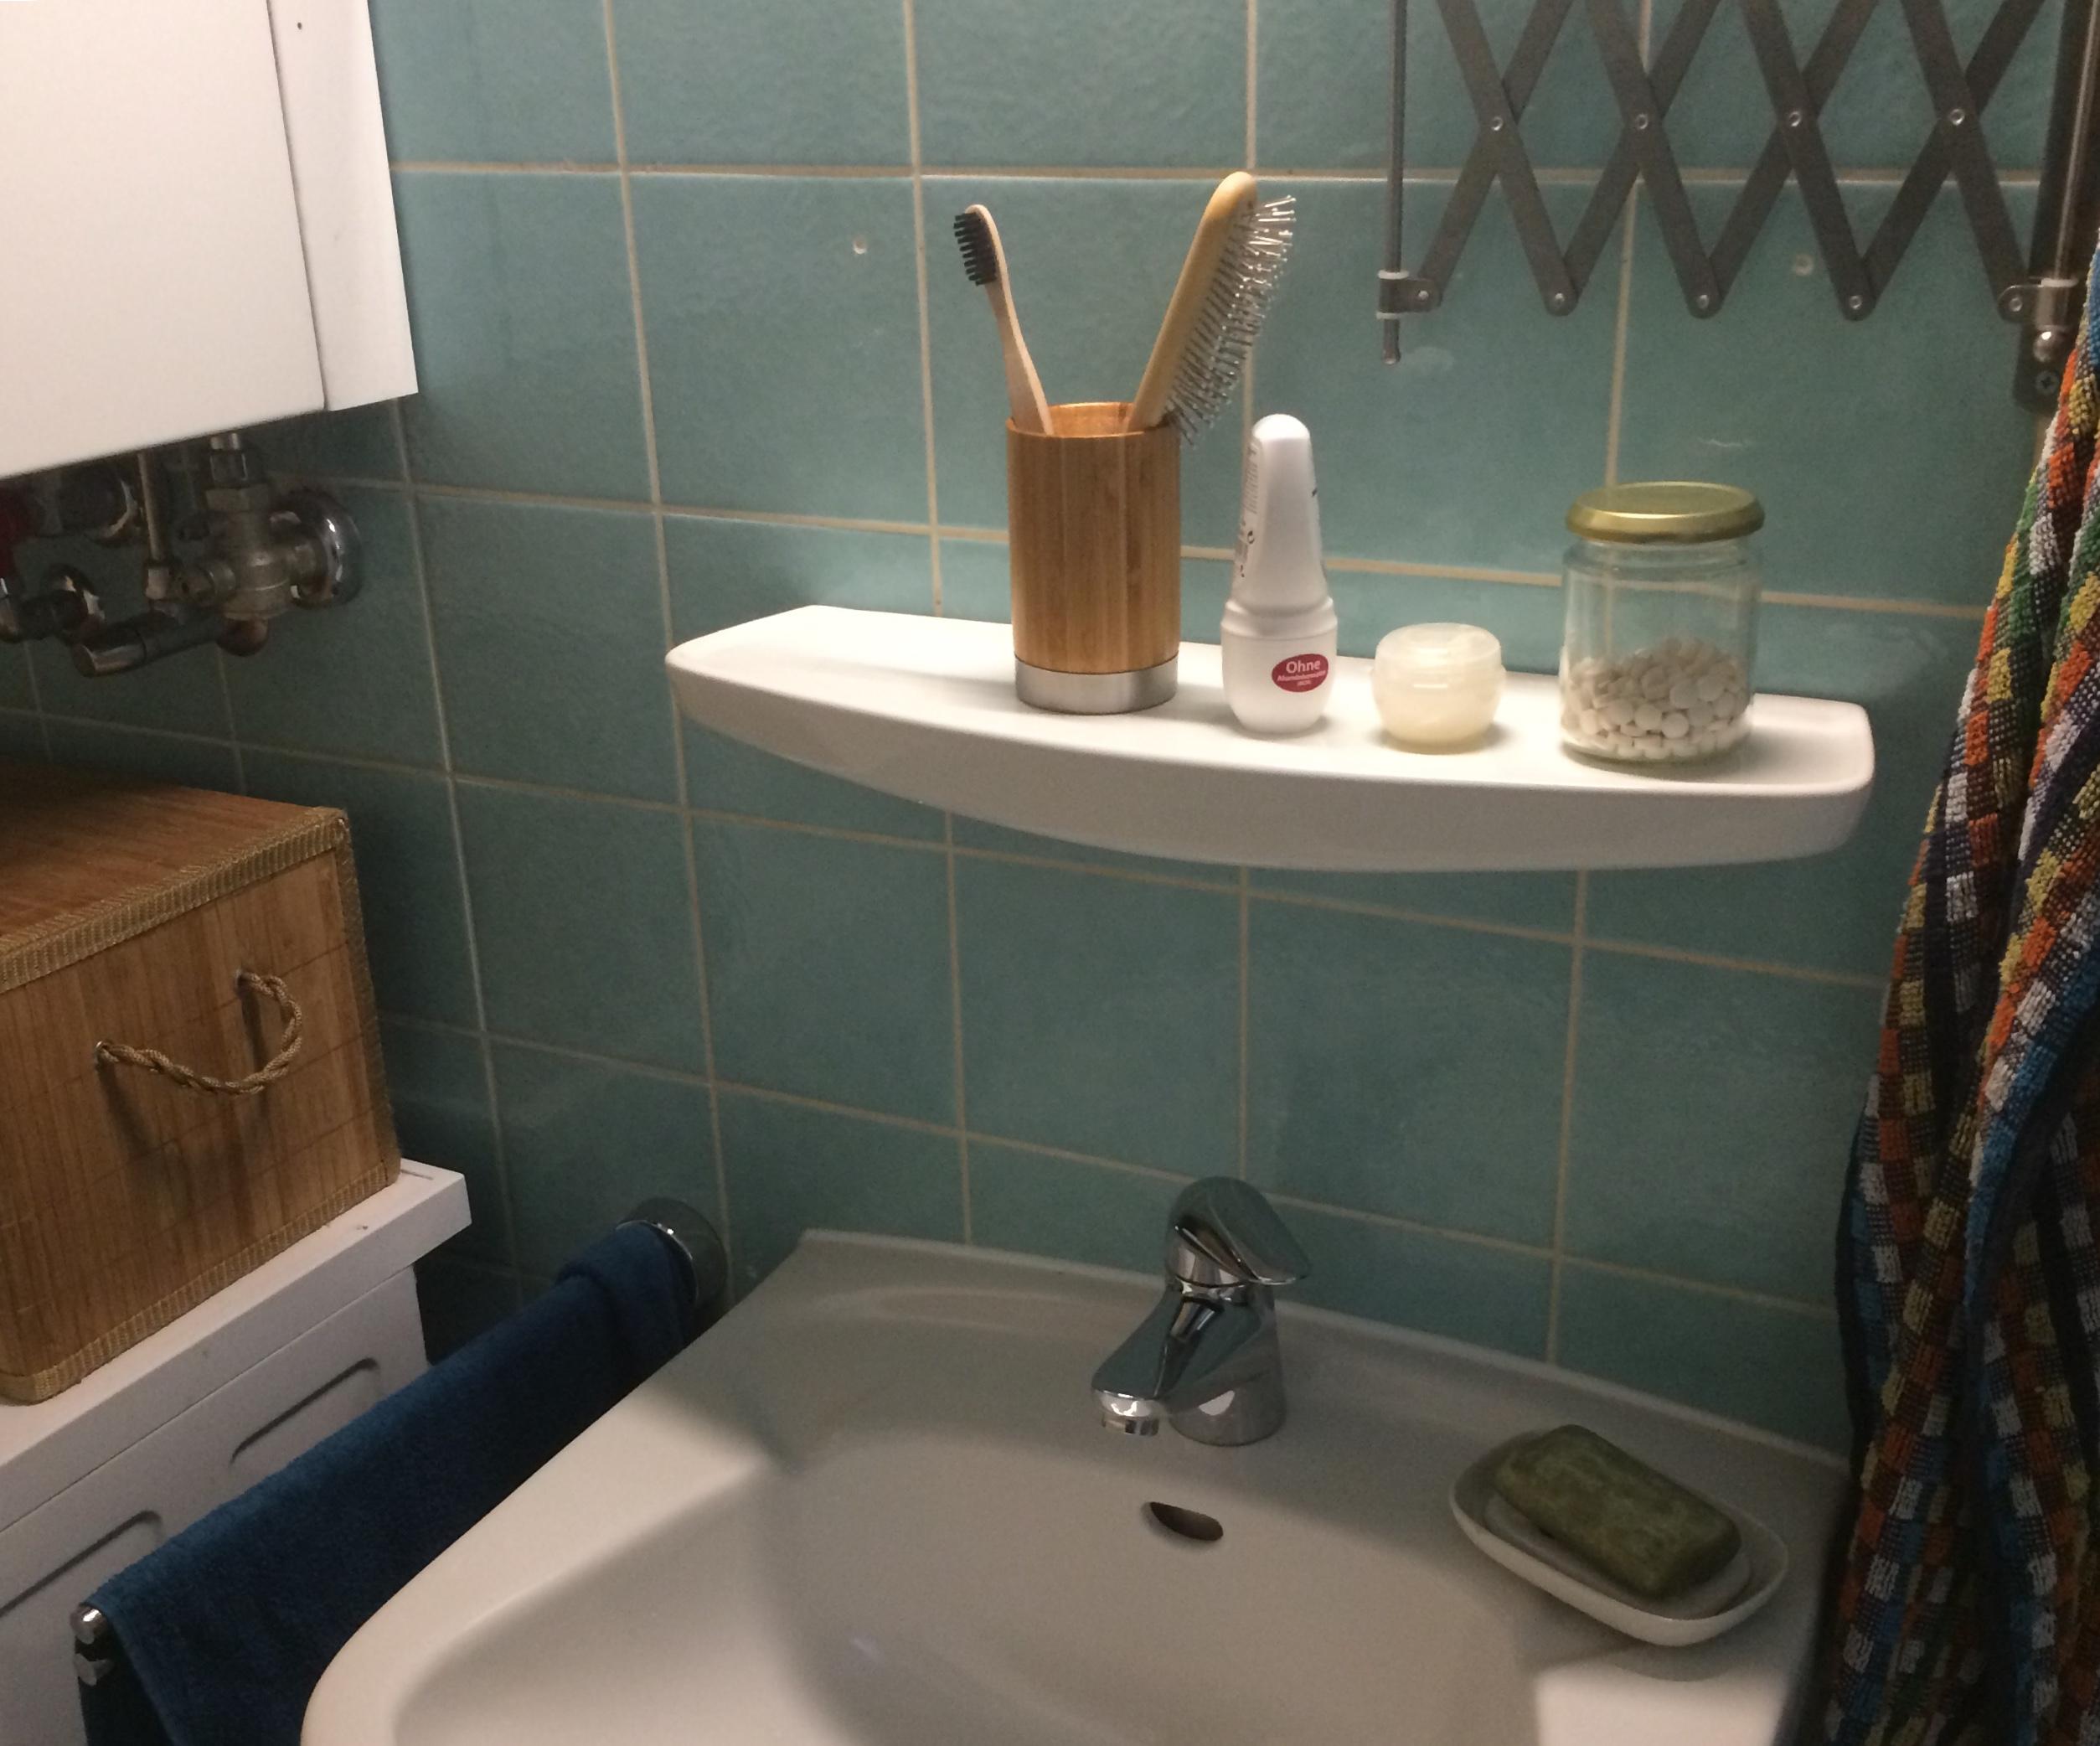 Minimalismus im Badezimmer – Achtsamer Minimalismus